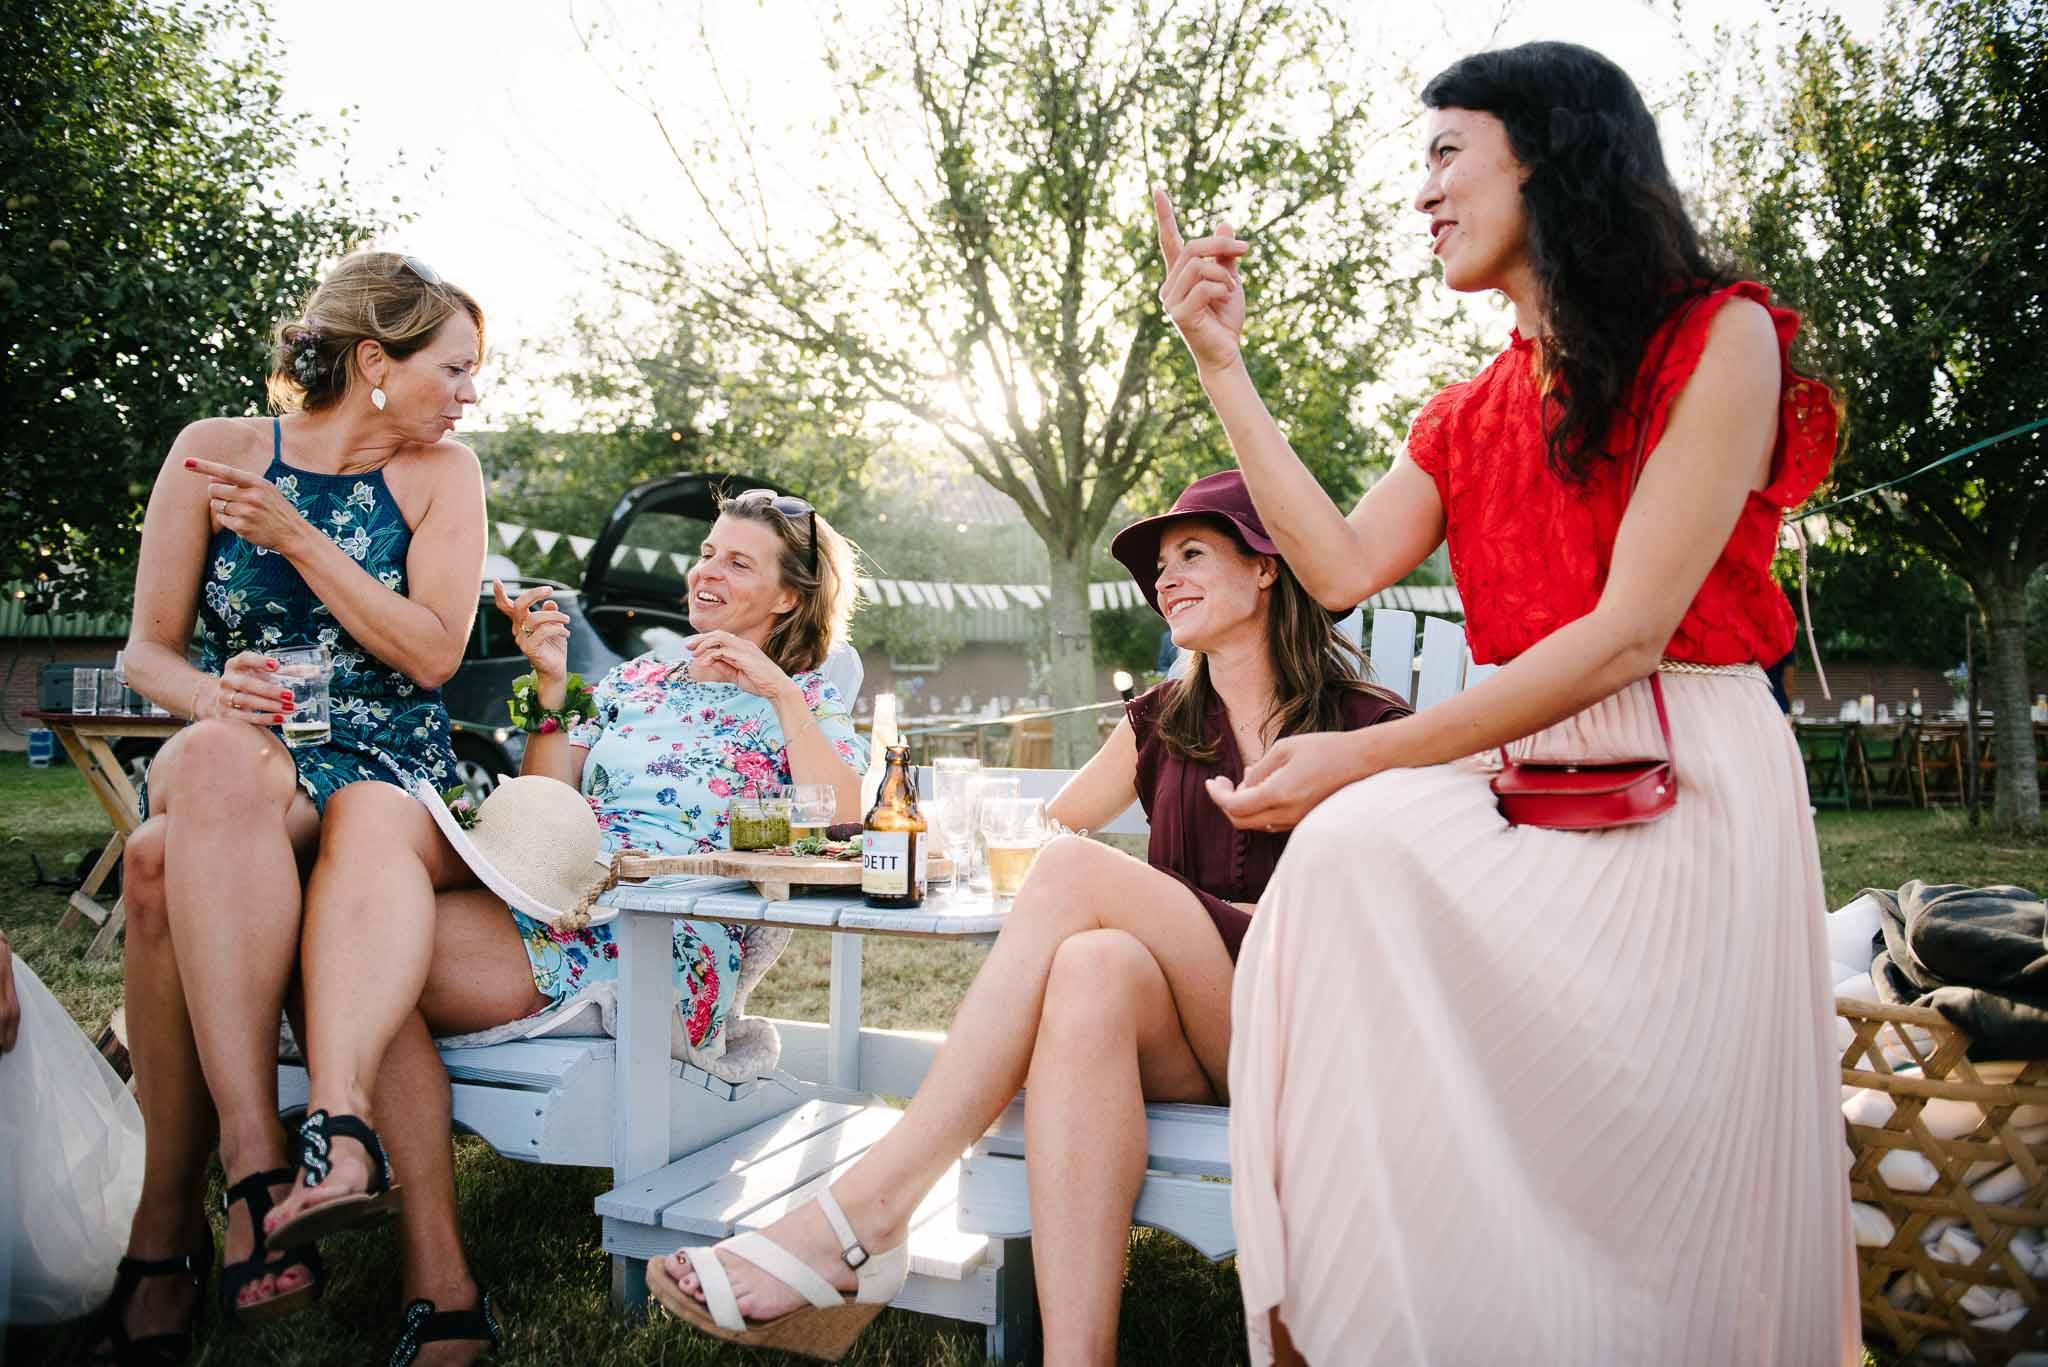 bohemian bruiloft festival stijl buiten